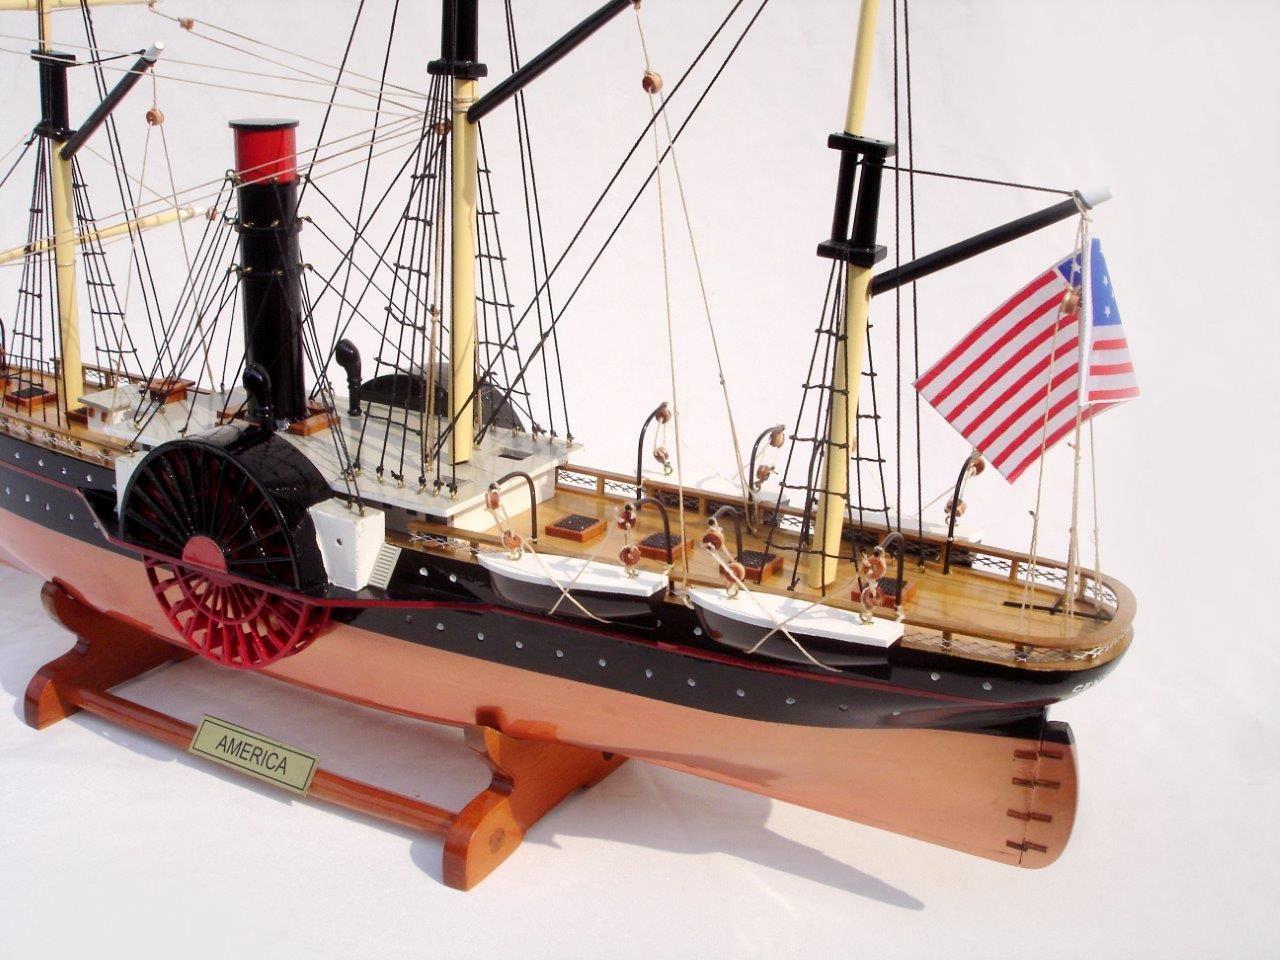 2054-12153-SS-Califonia-ship-model